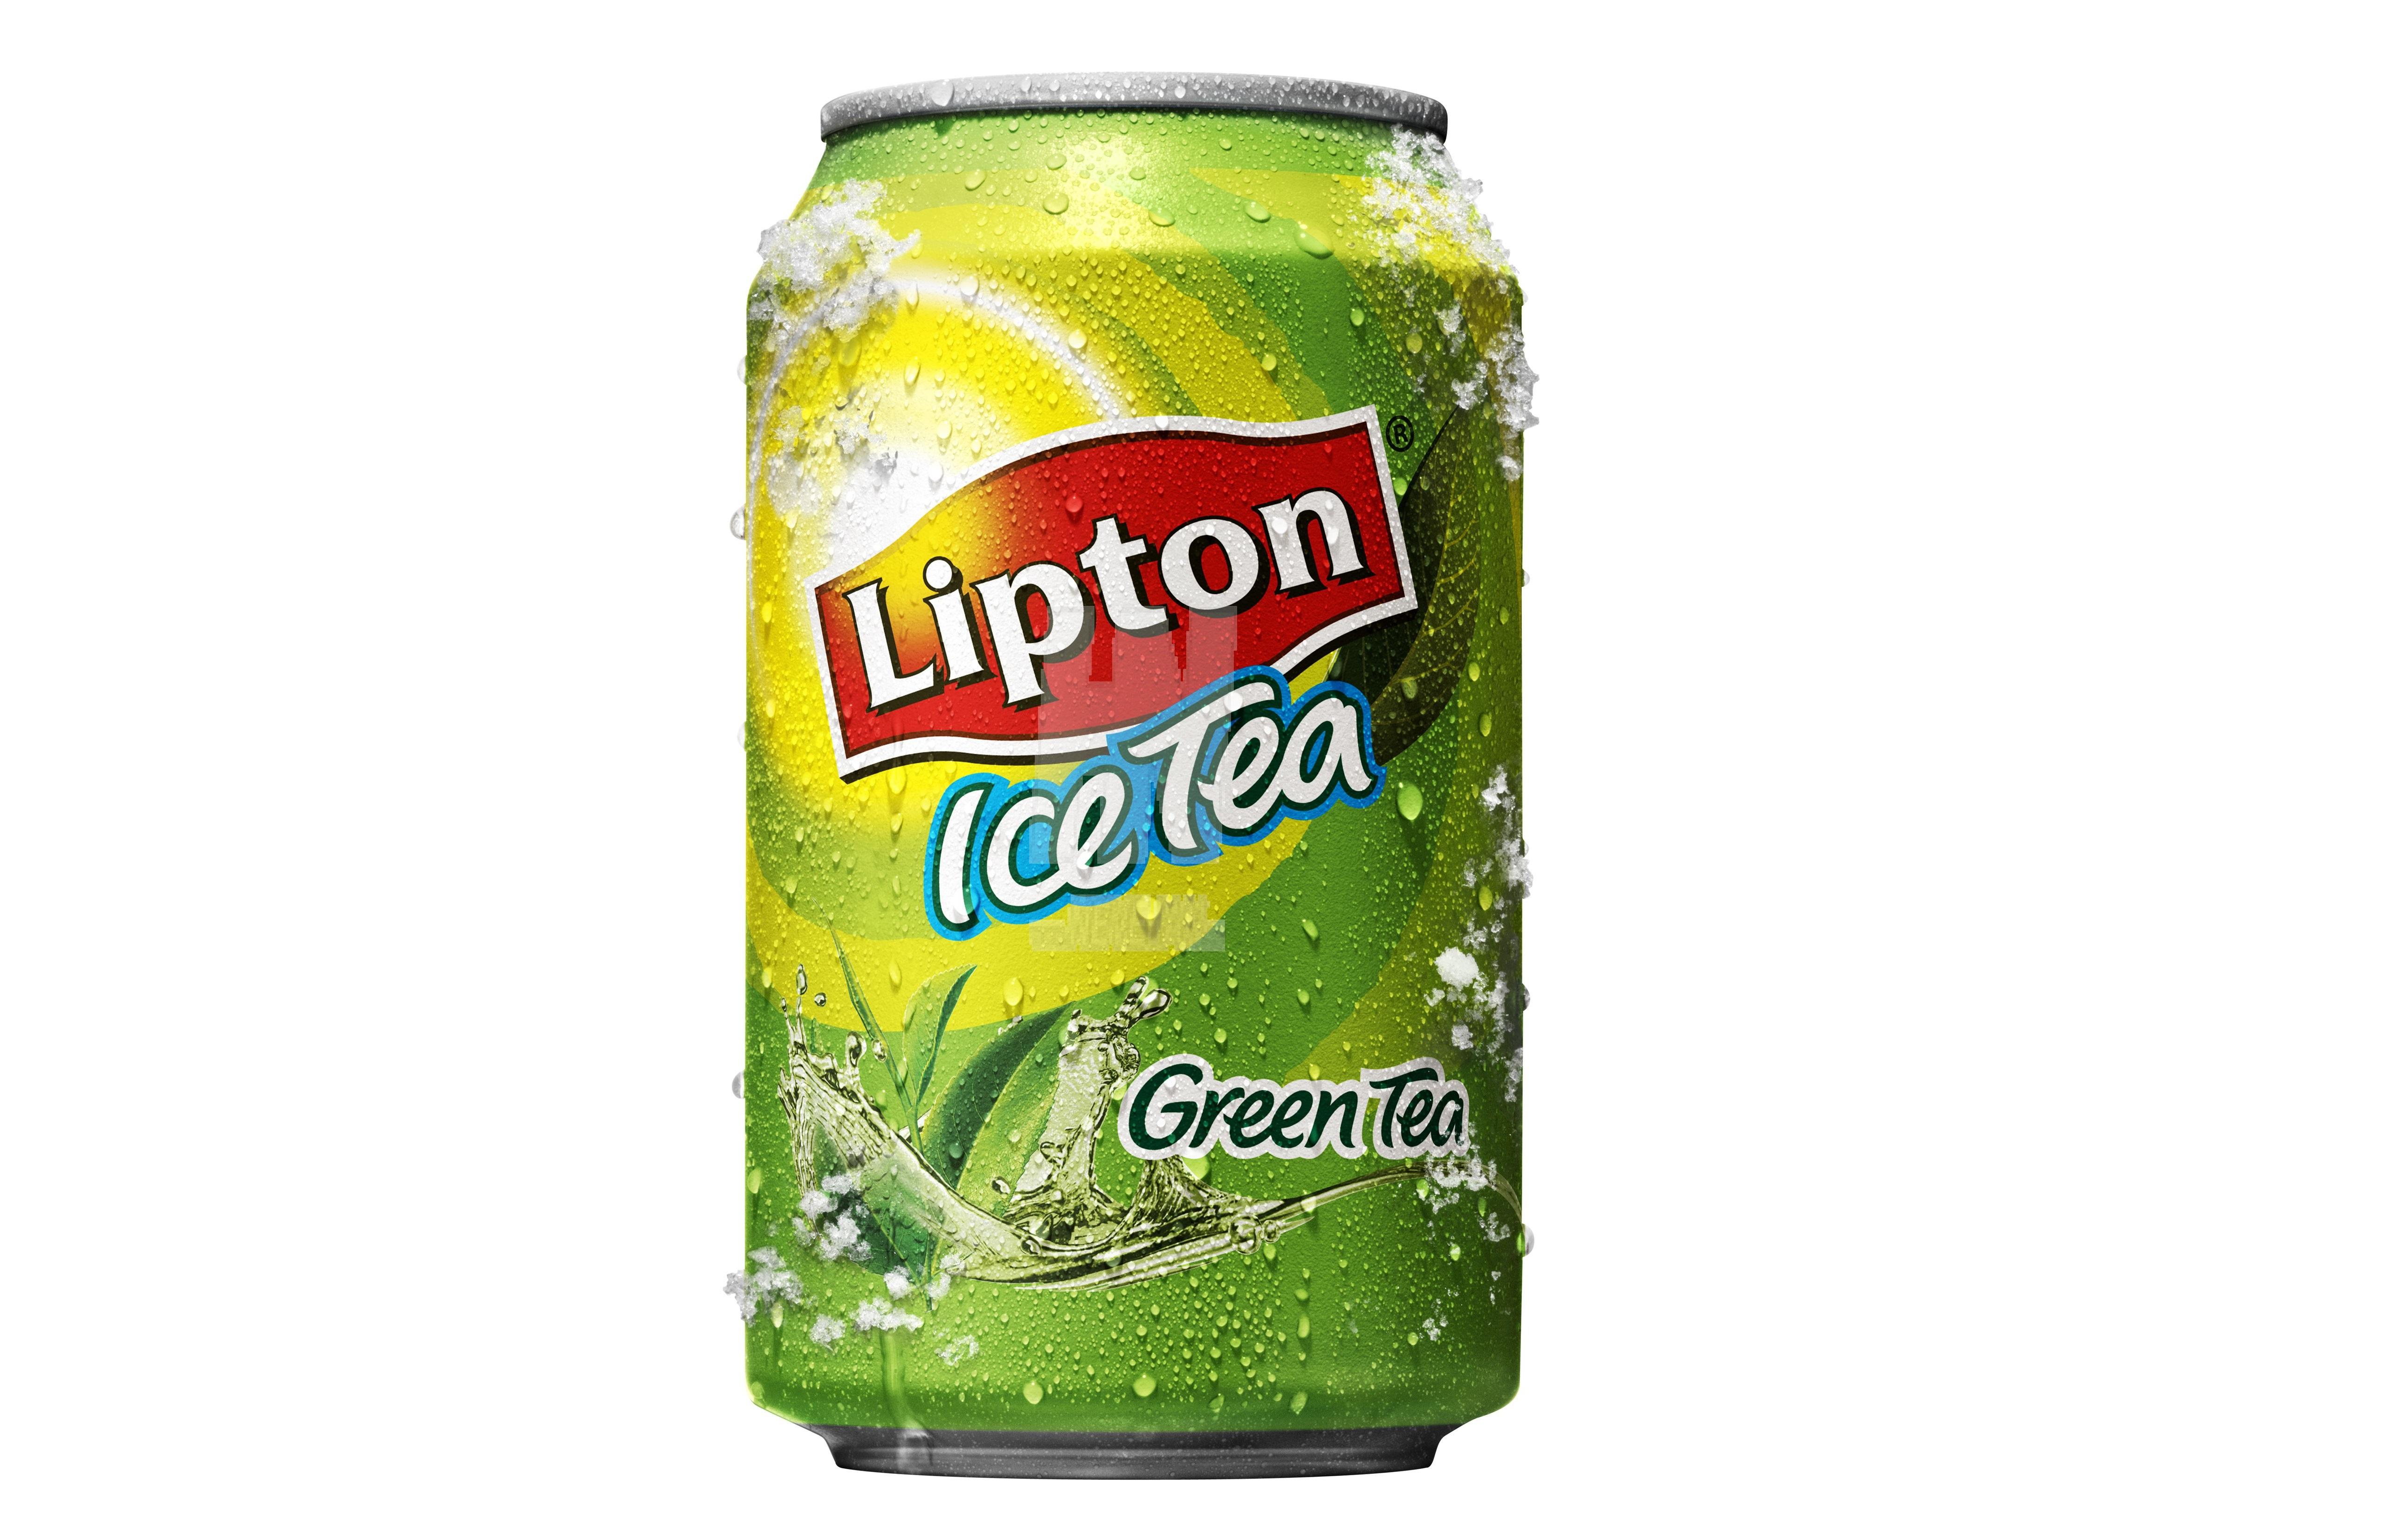 Lipton Pictures